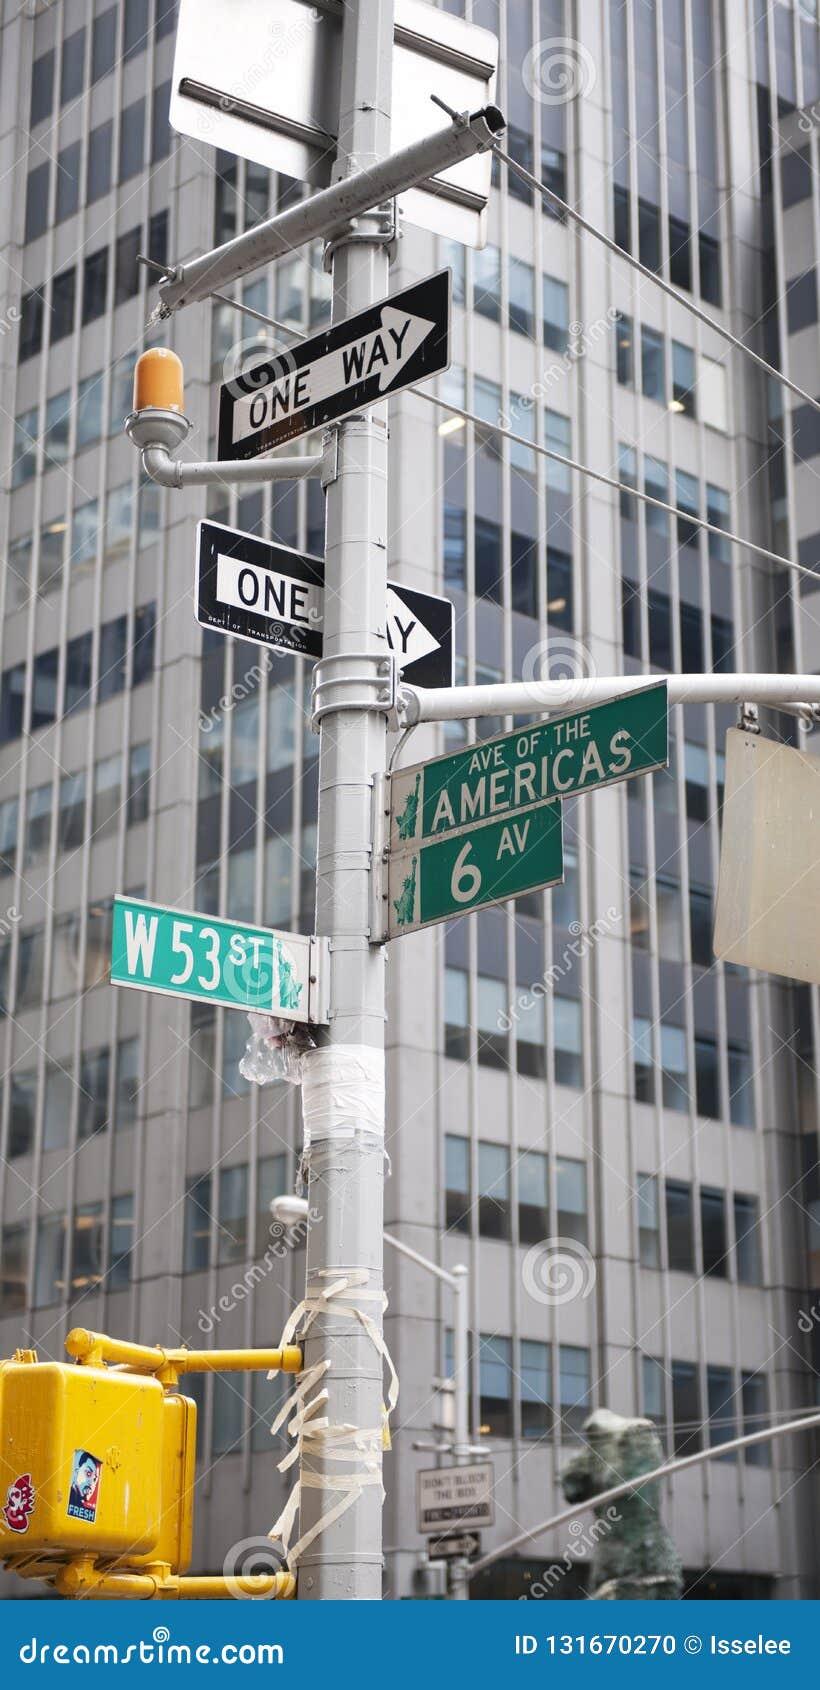 Street signs in New York City, New York, USA